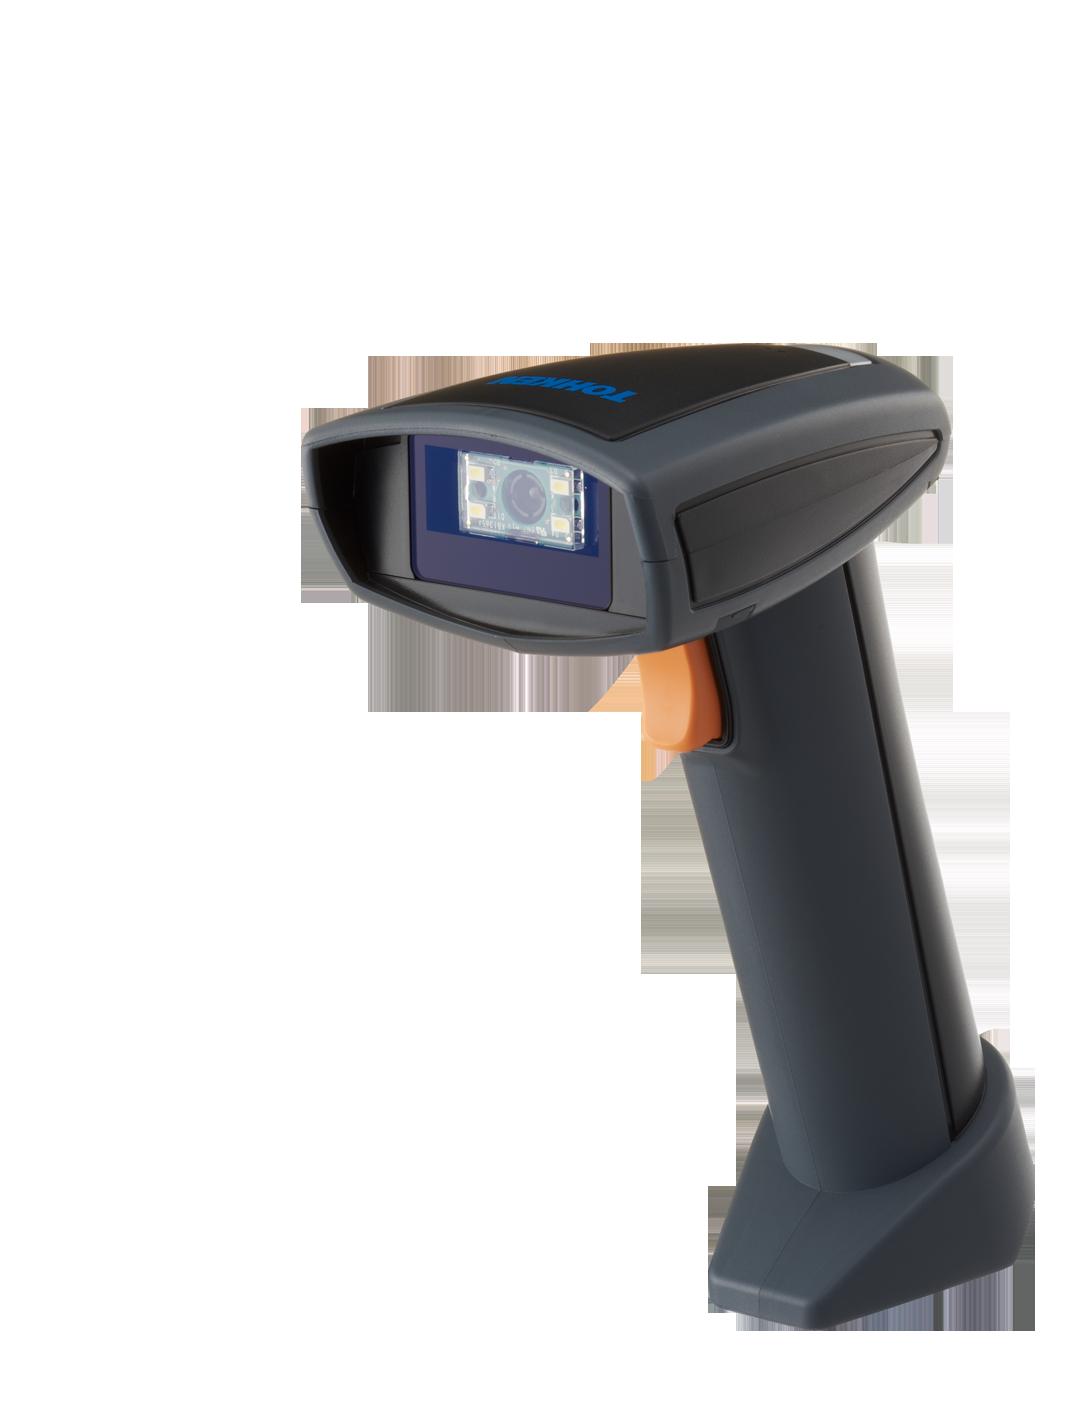 TOHEKN THIR-6000二维扫描器